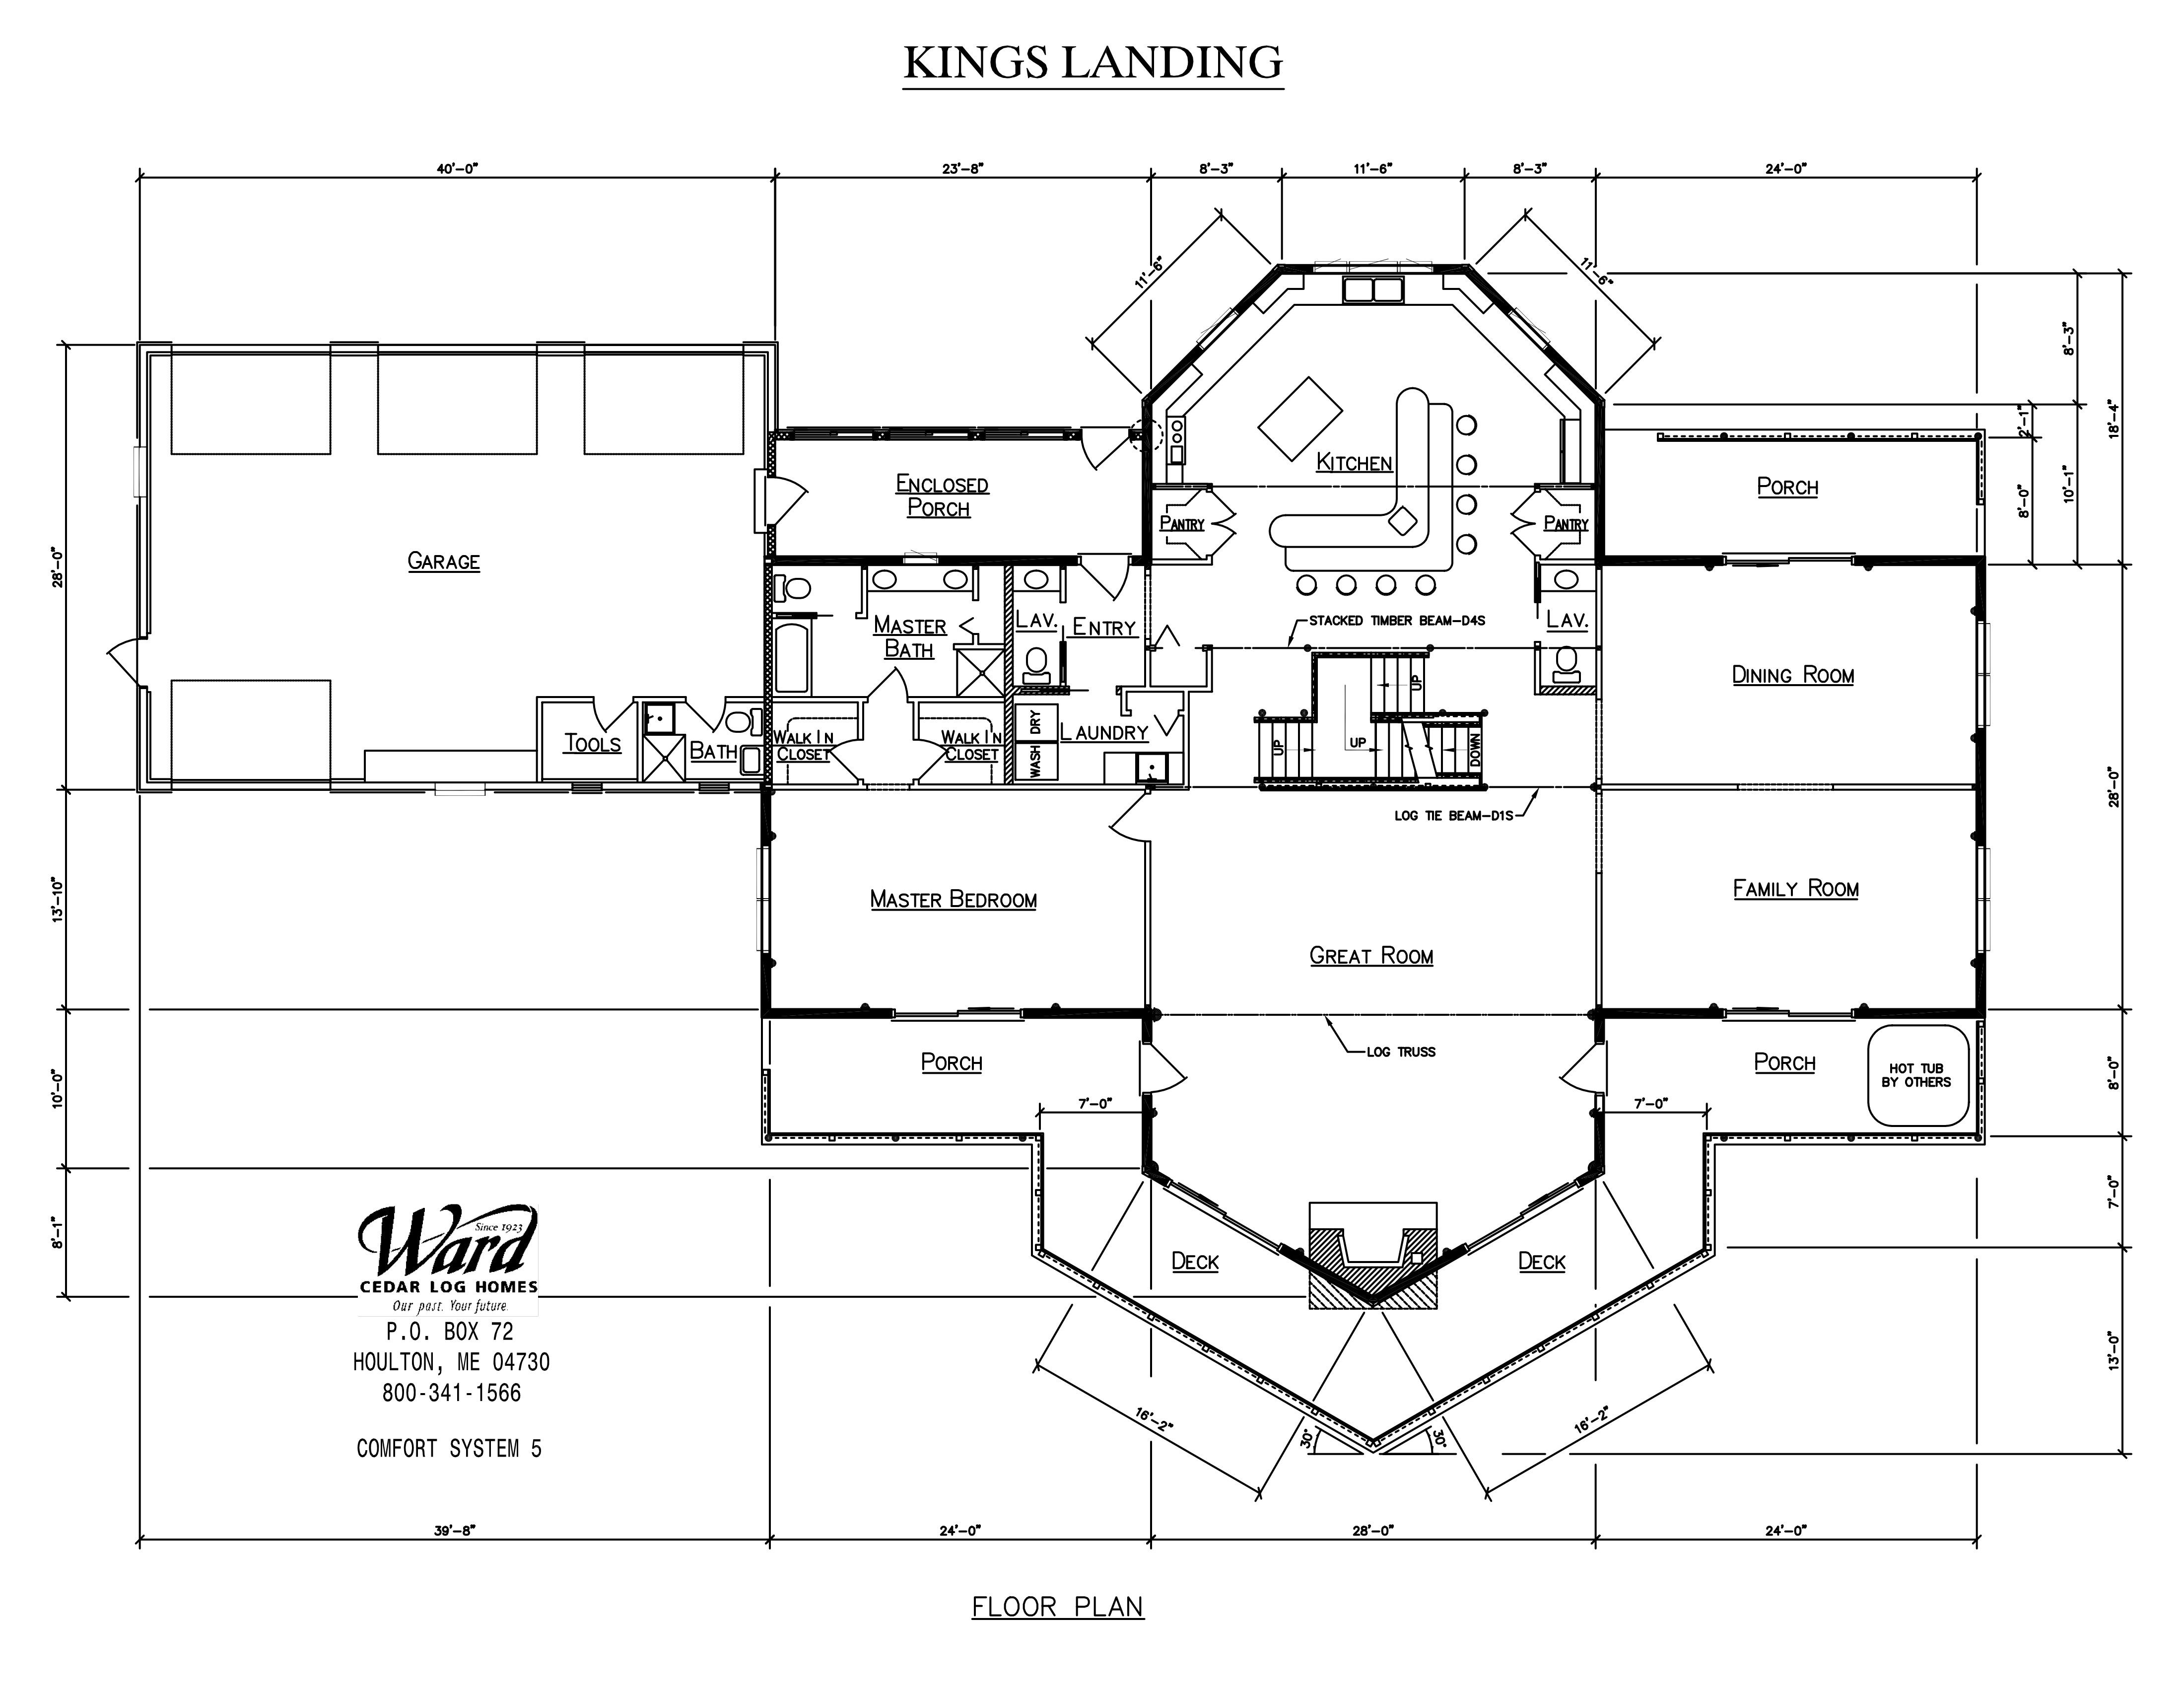 Kings Landing floor plan. Download the plan at www.wardcedarloghomes ...